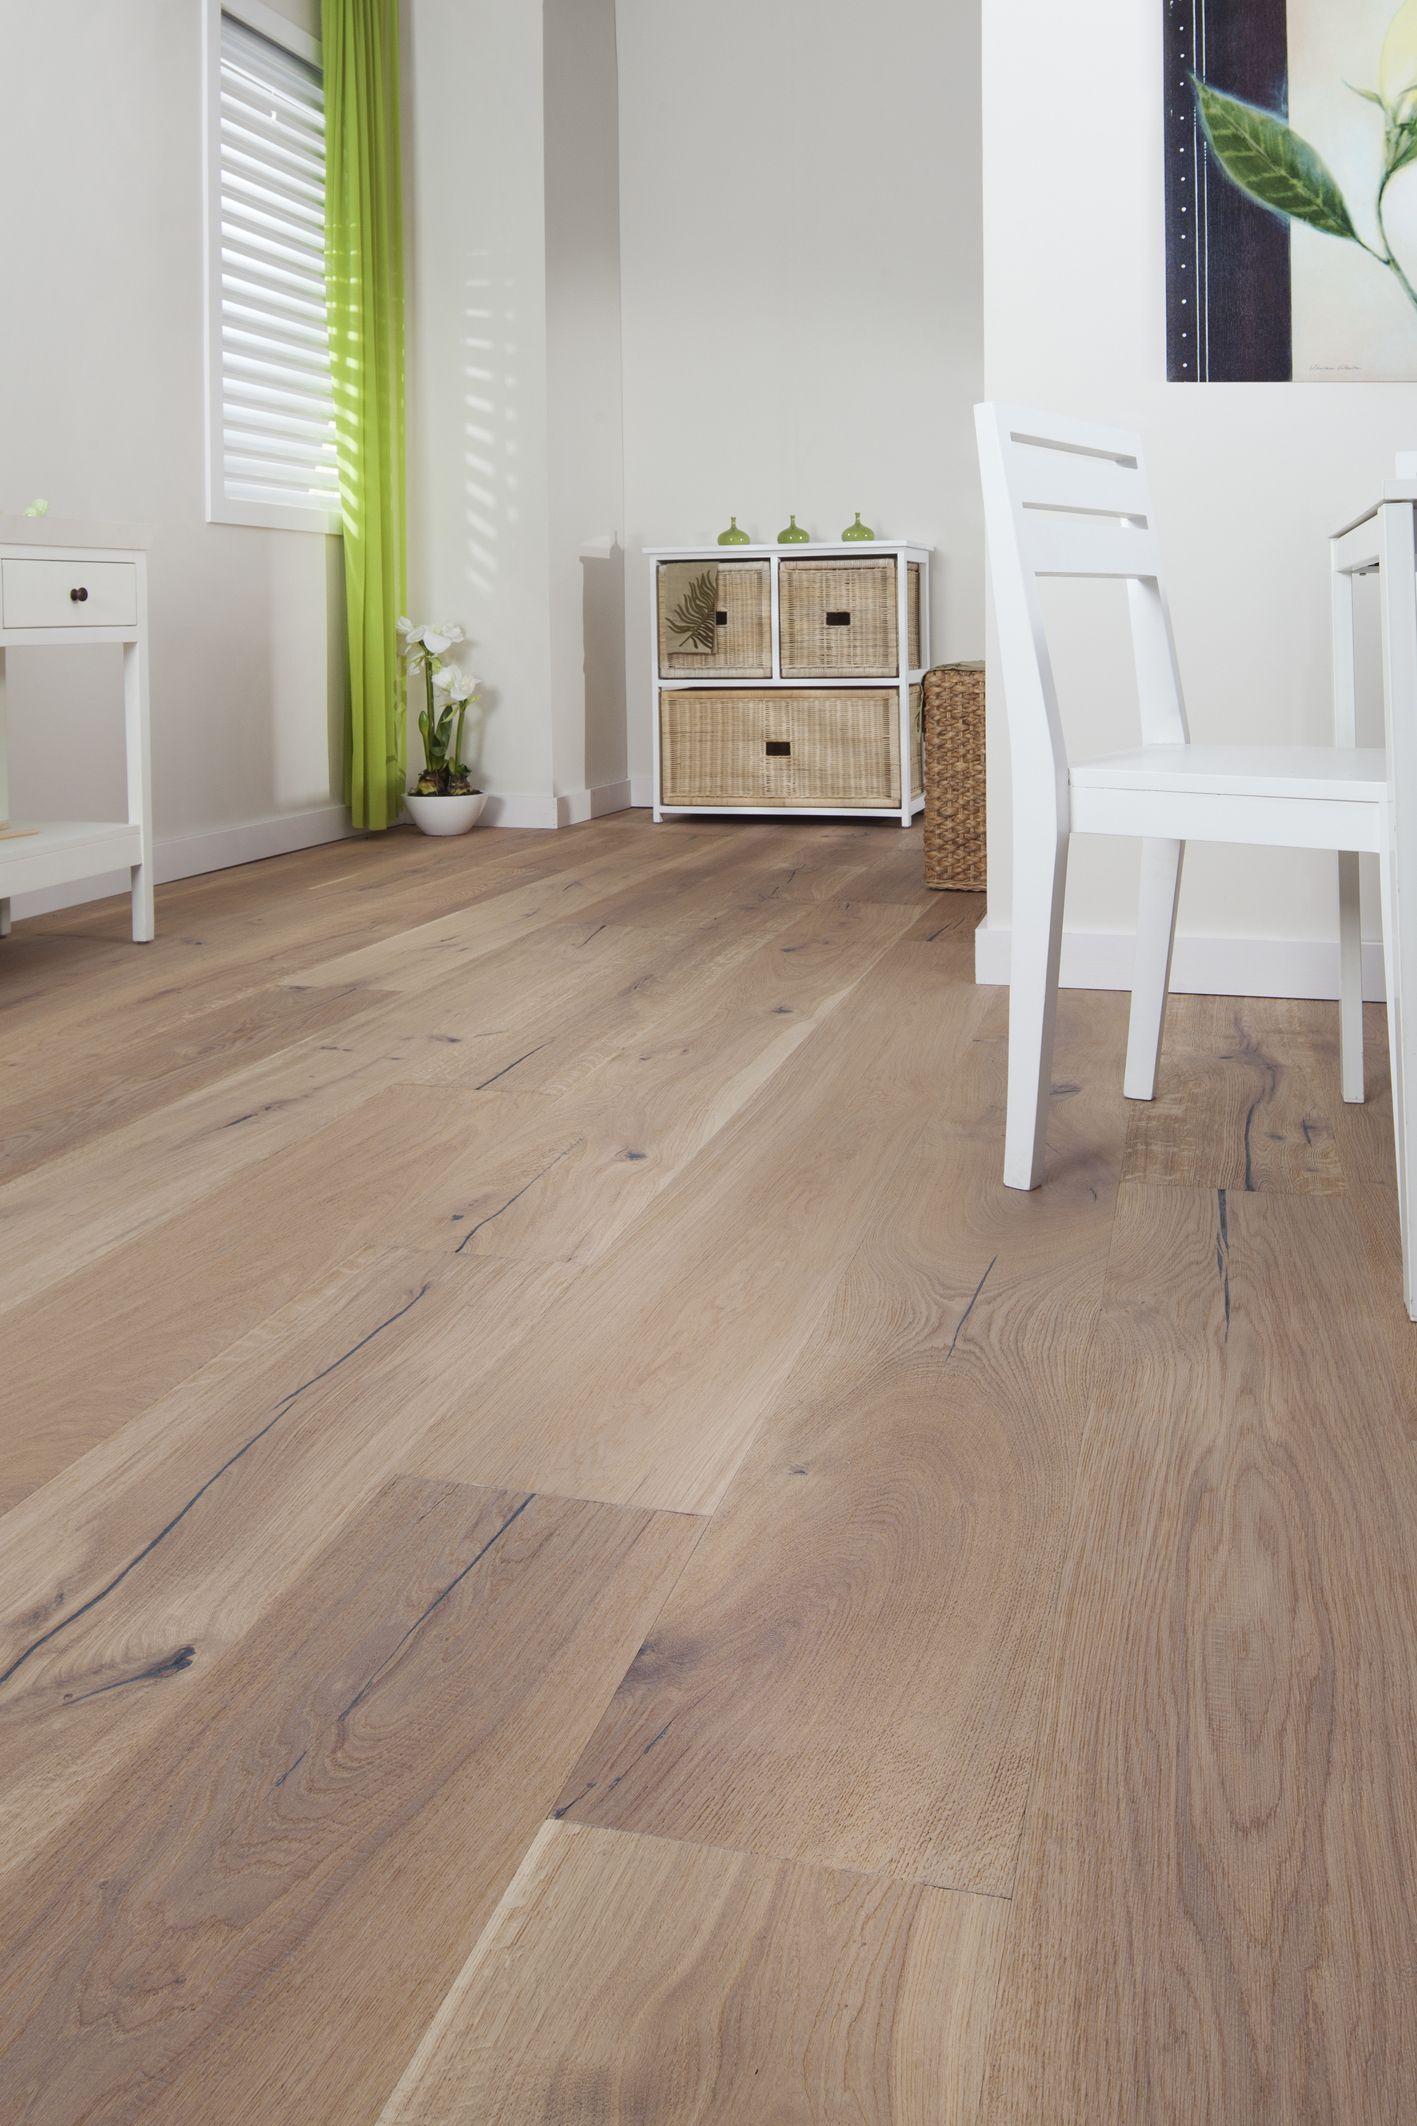 French Oak Flooring by Arrow Sun Australia: Wild Oak Rouen 240mm ...